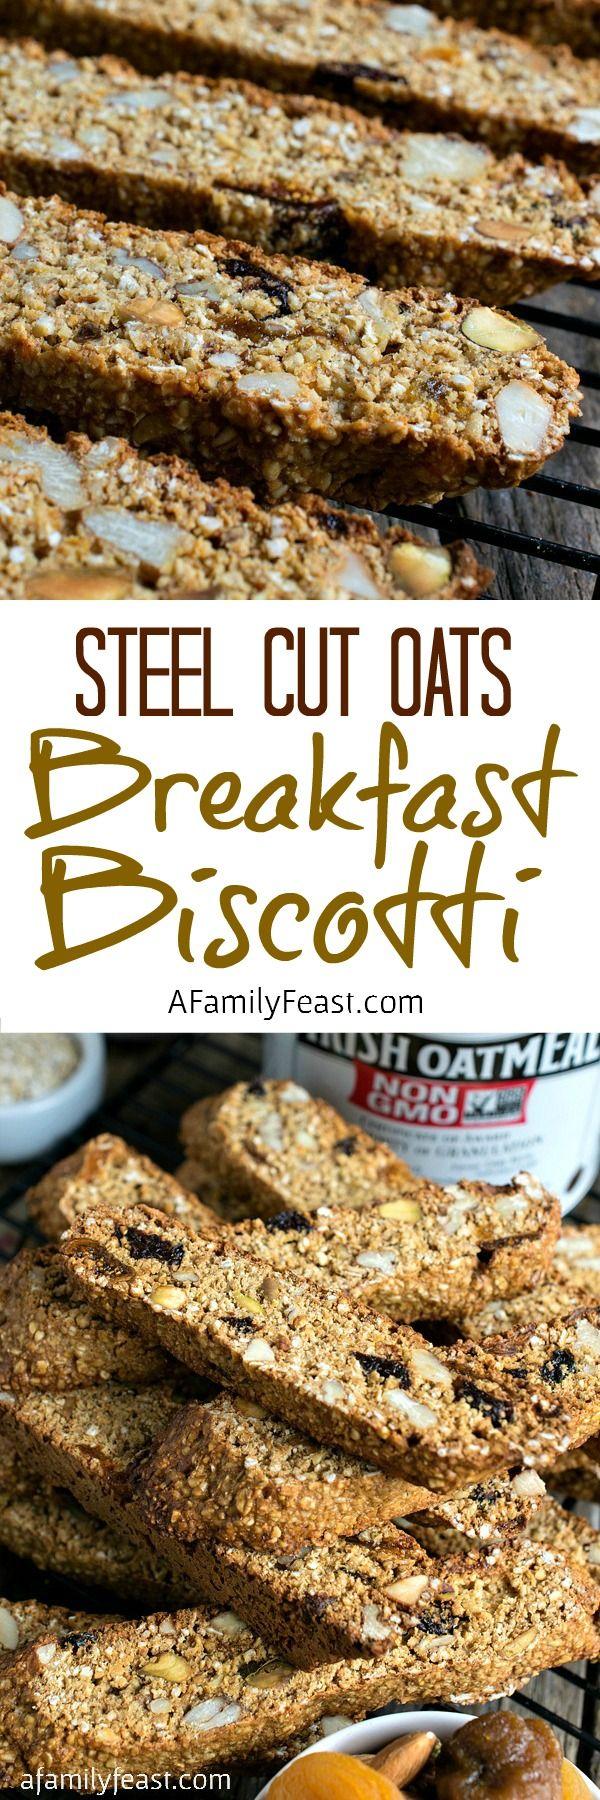 Steel Cut Oats Breakfast Biscotti is part of Oats breakfast - Steel Cut Oats Breakfast Biscotti  A hearty, delicious breakfast biscotti chock full of nuts, dried fruit and McCann's Steel Cut Irish Oatmeal